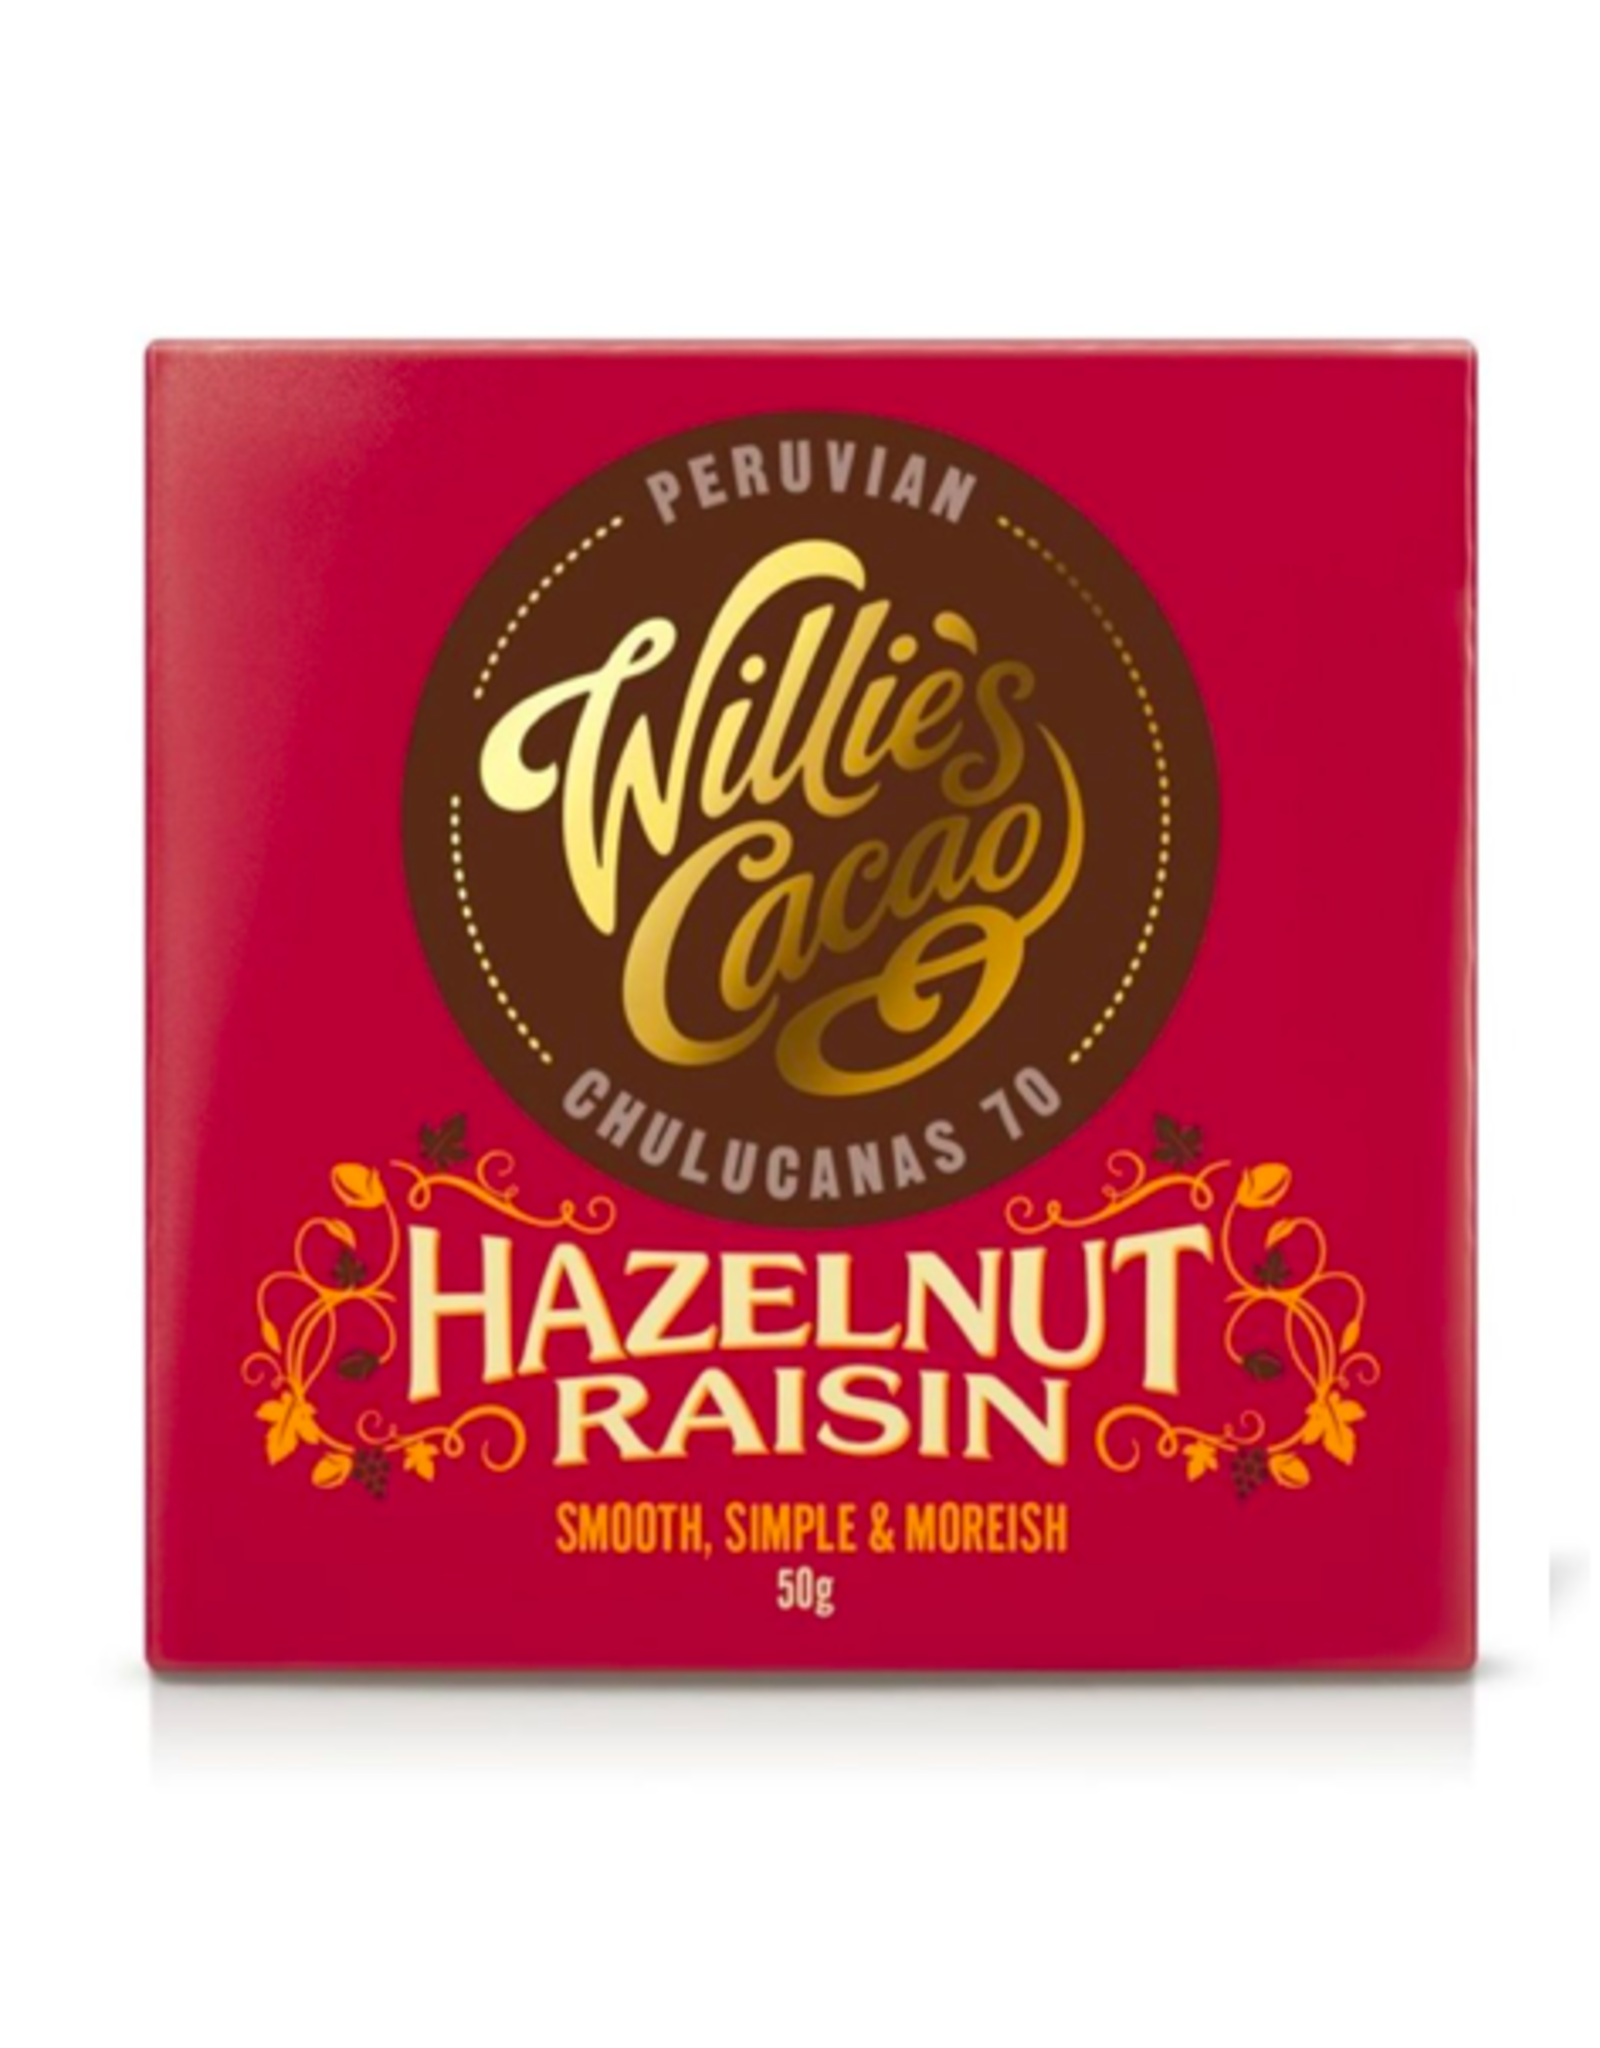 DLE - Willie's Cacao Hazelnut Raisin Bar 50g